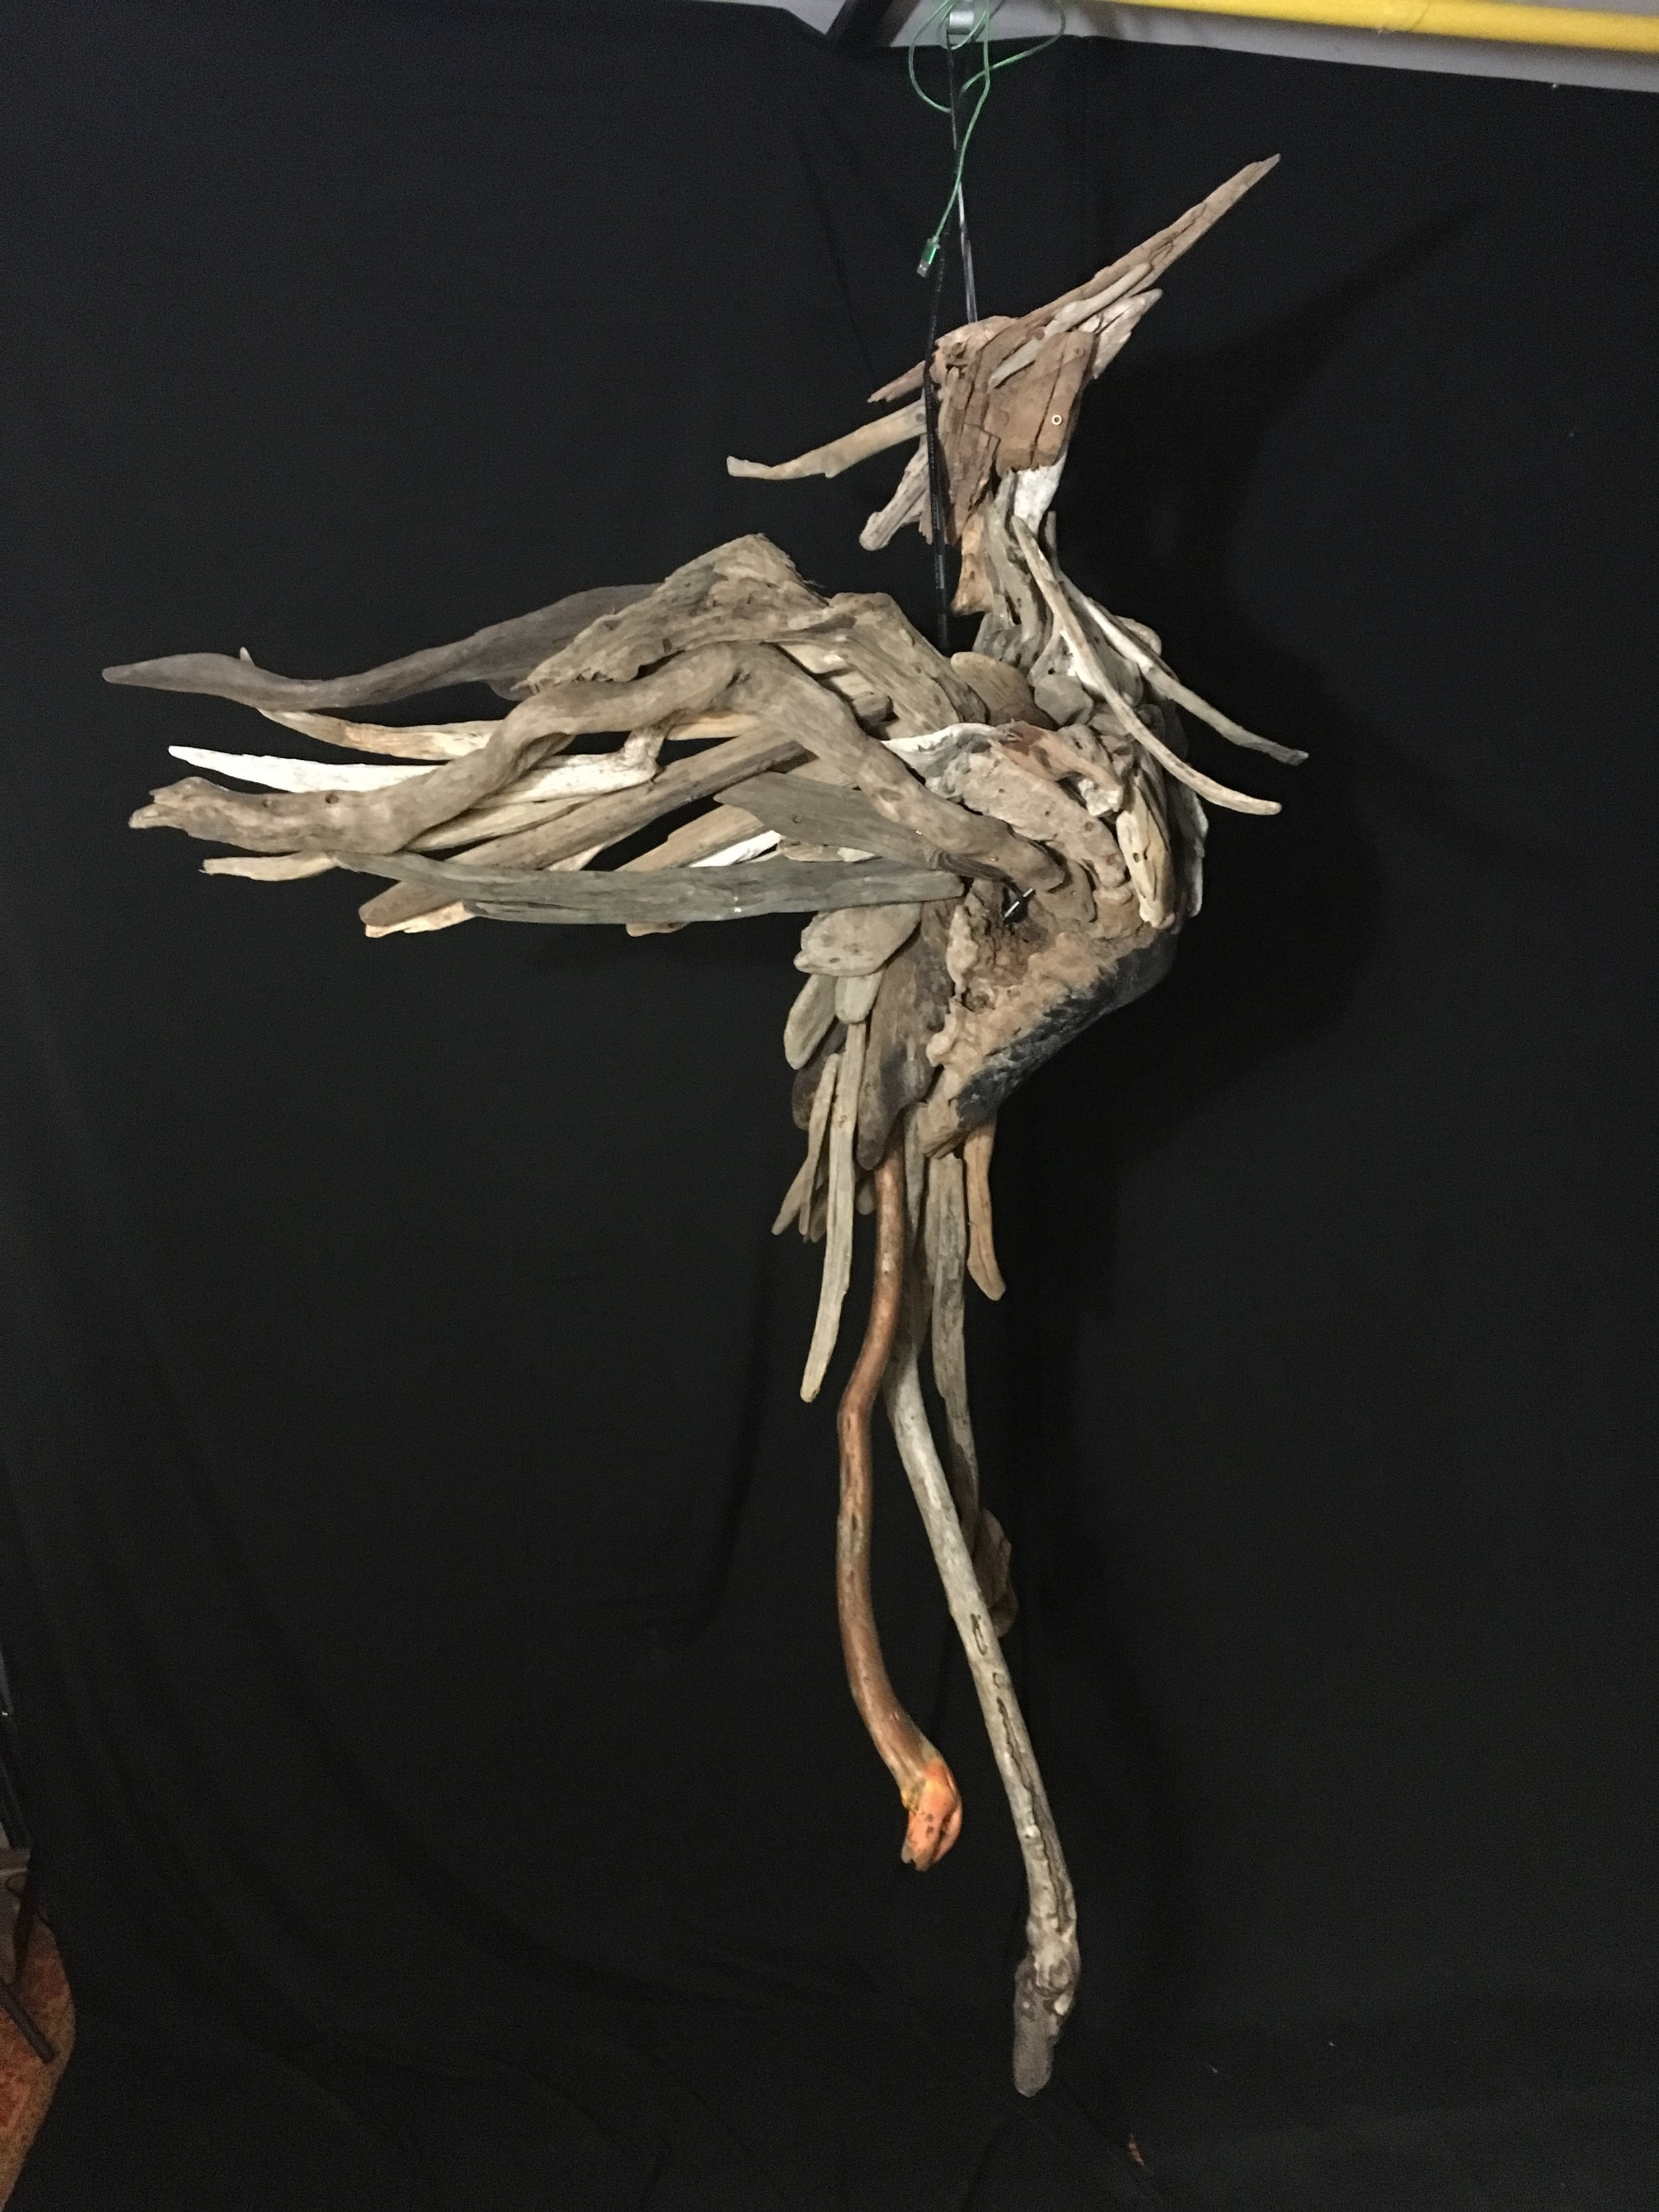 A Rising Phoenix